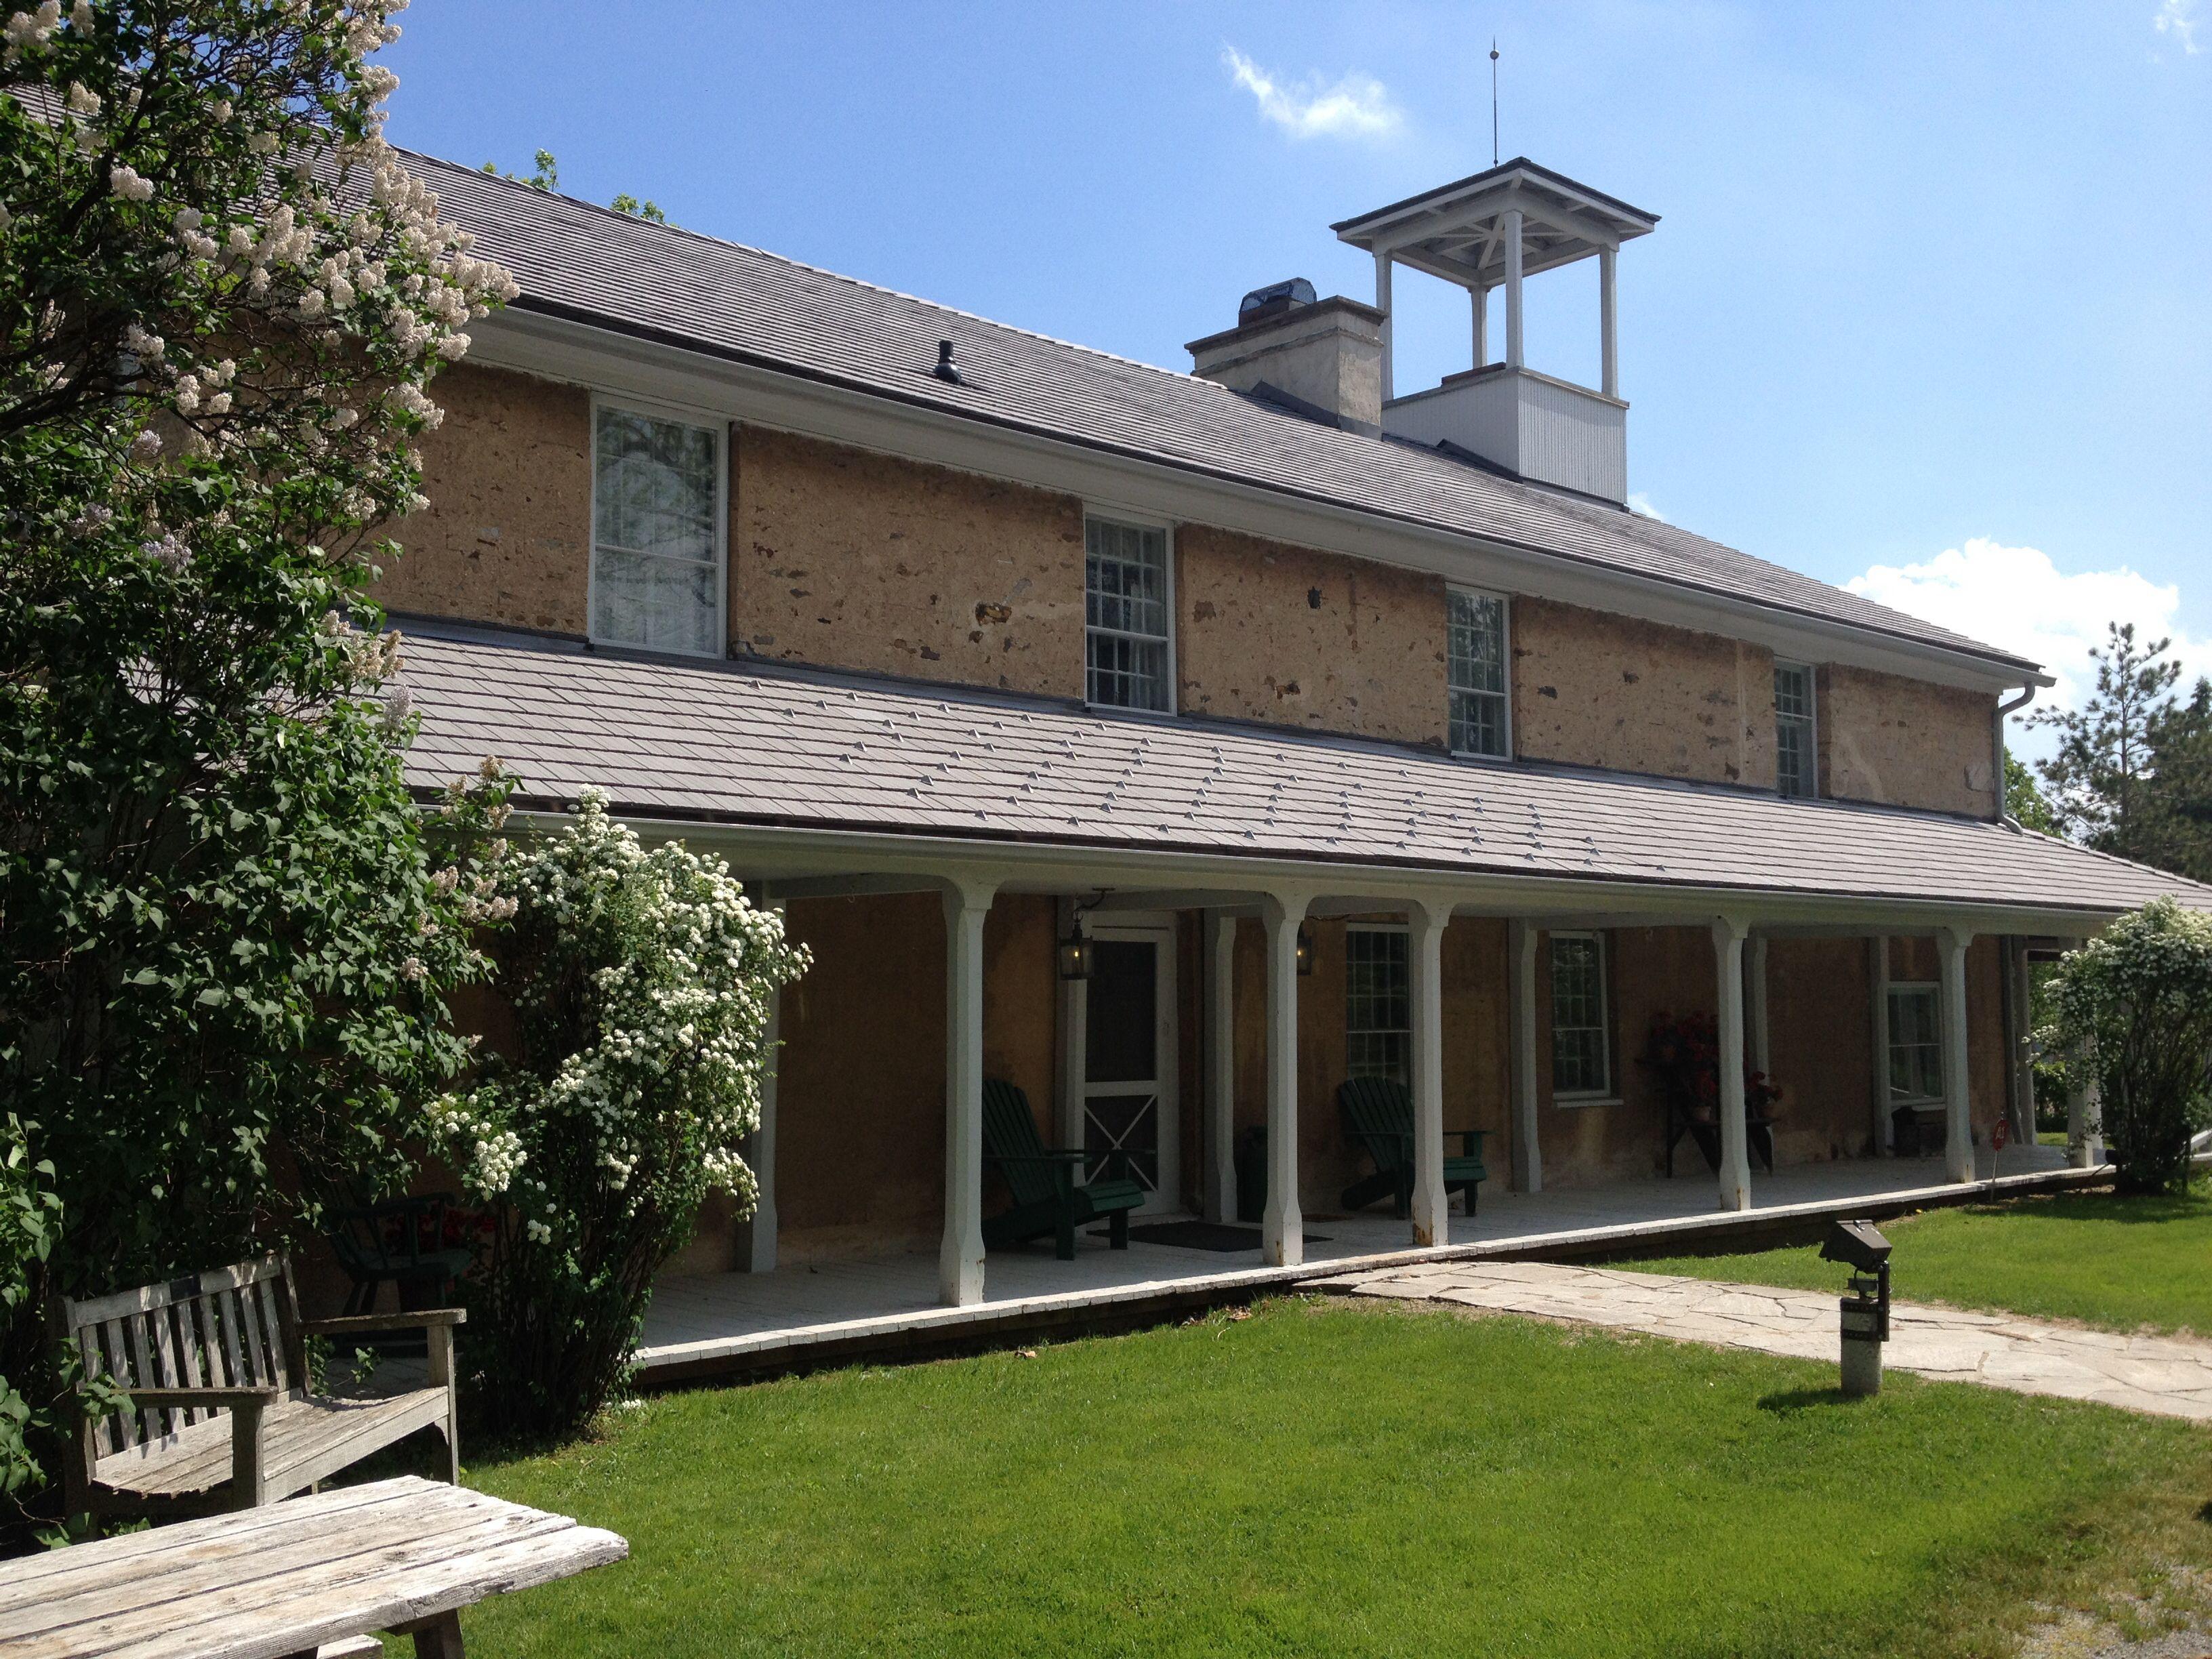 sunny day at ireland house museum in burlington ontario ontario rh pinterest com